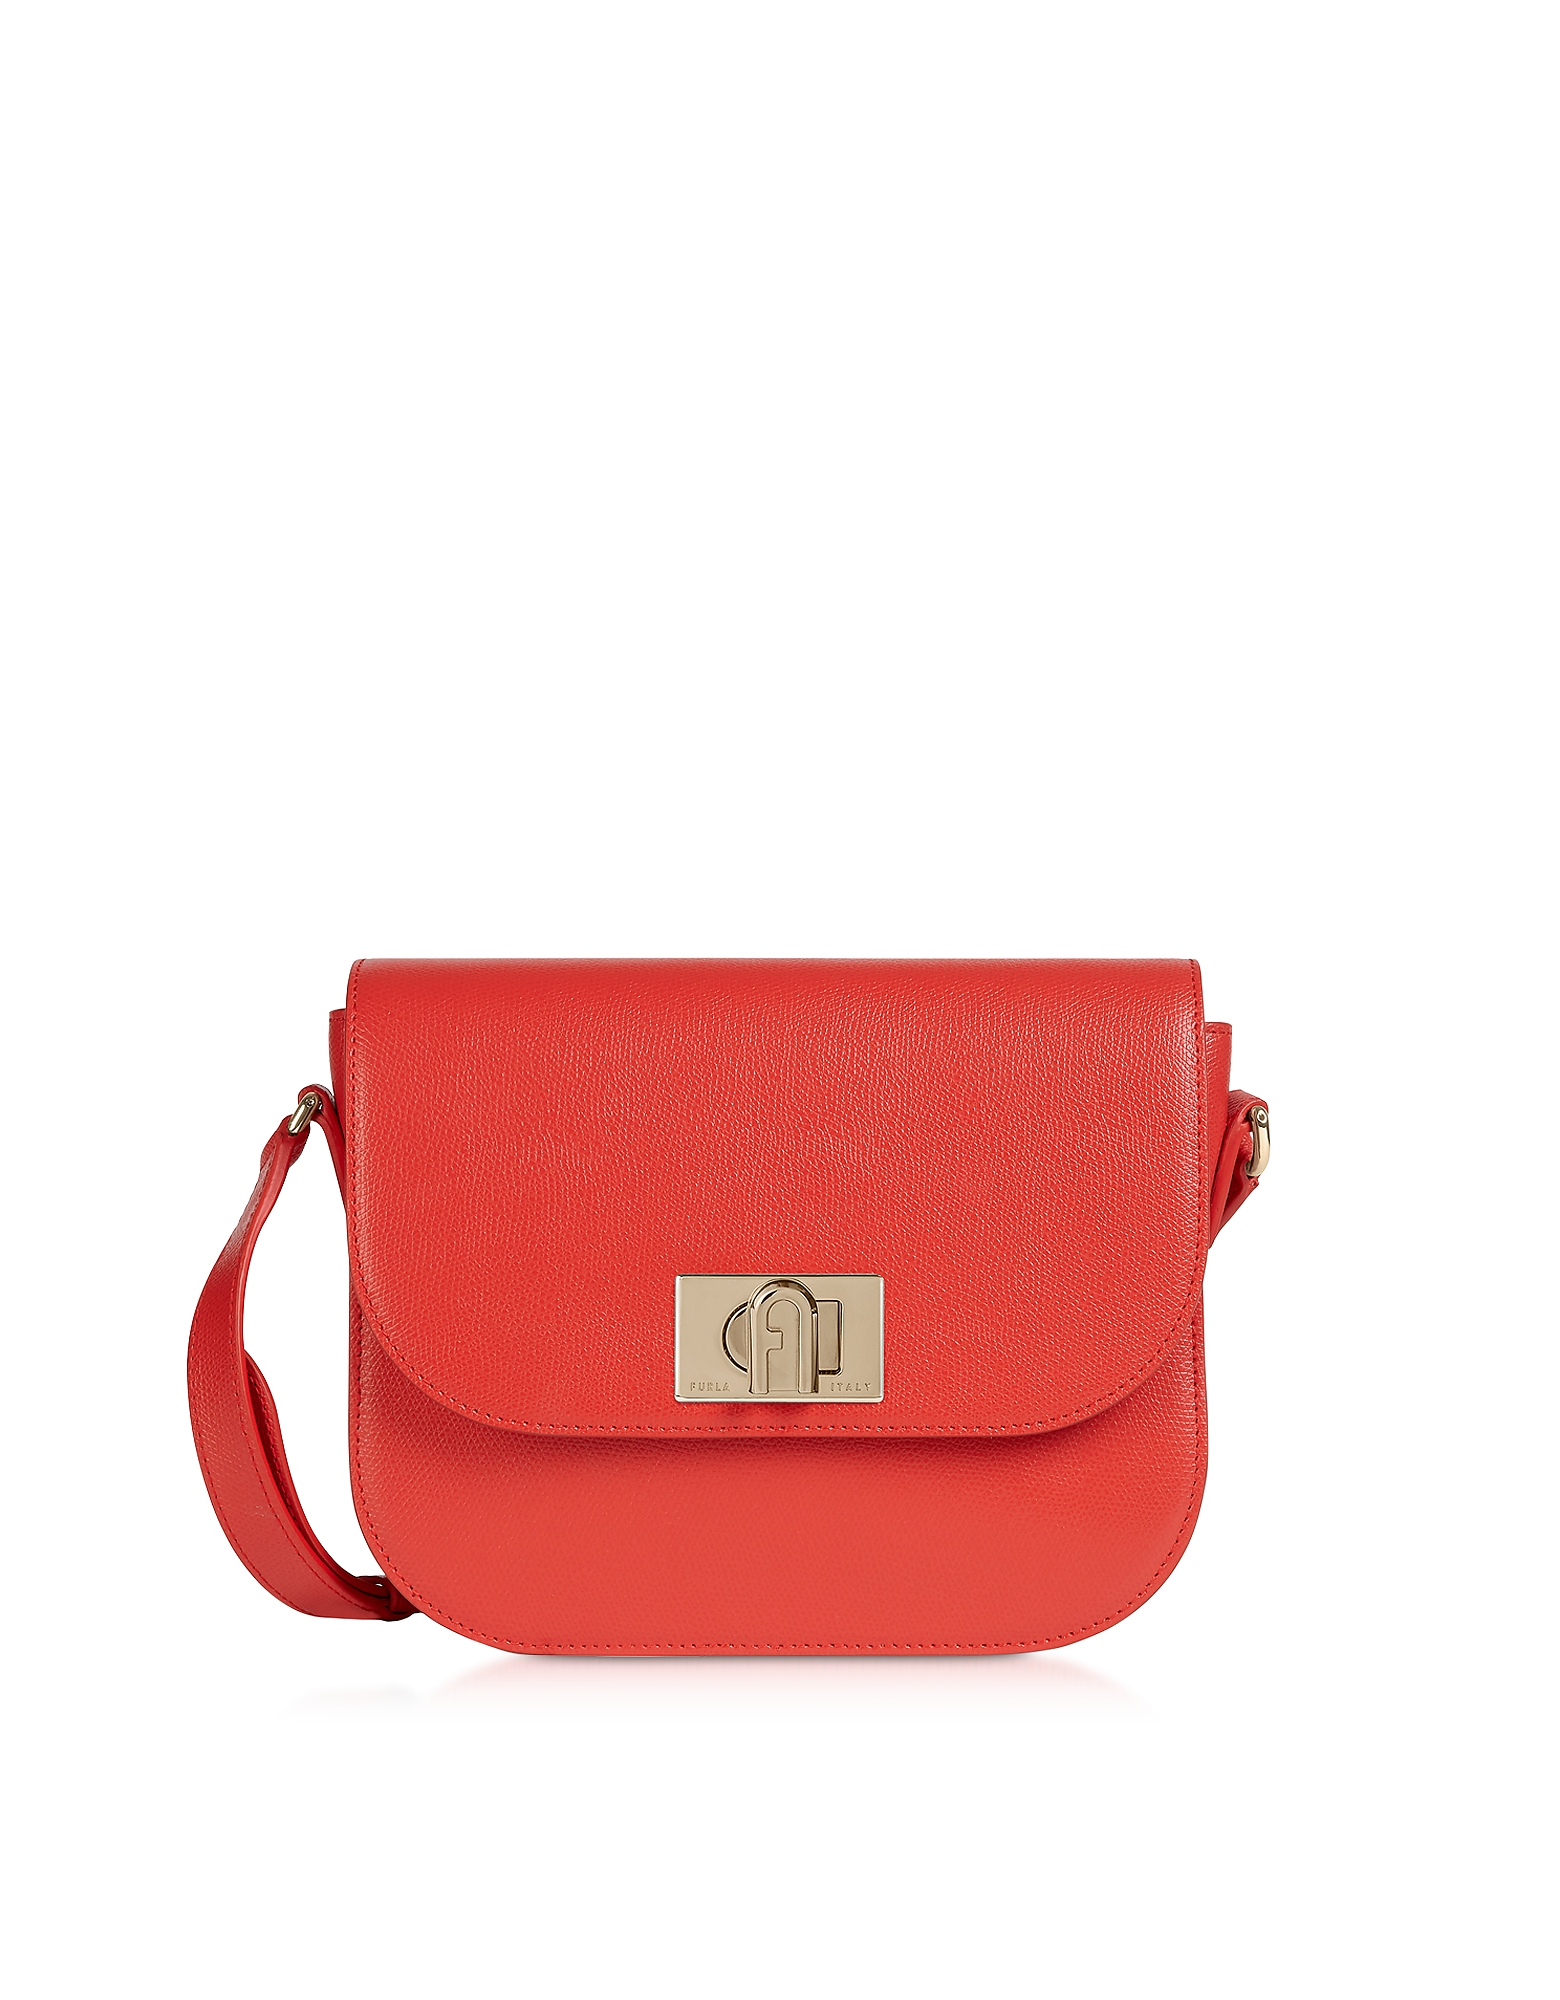 Furla Designer Handbags, 1927 S Crossbody Bag 23